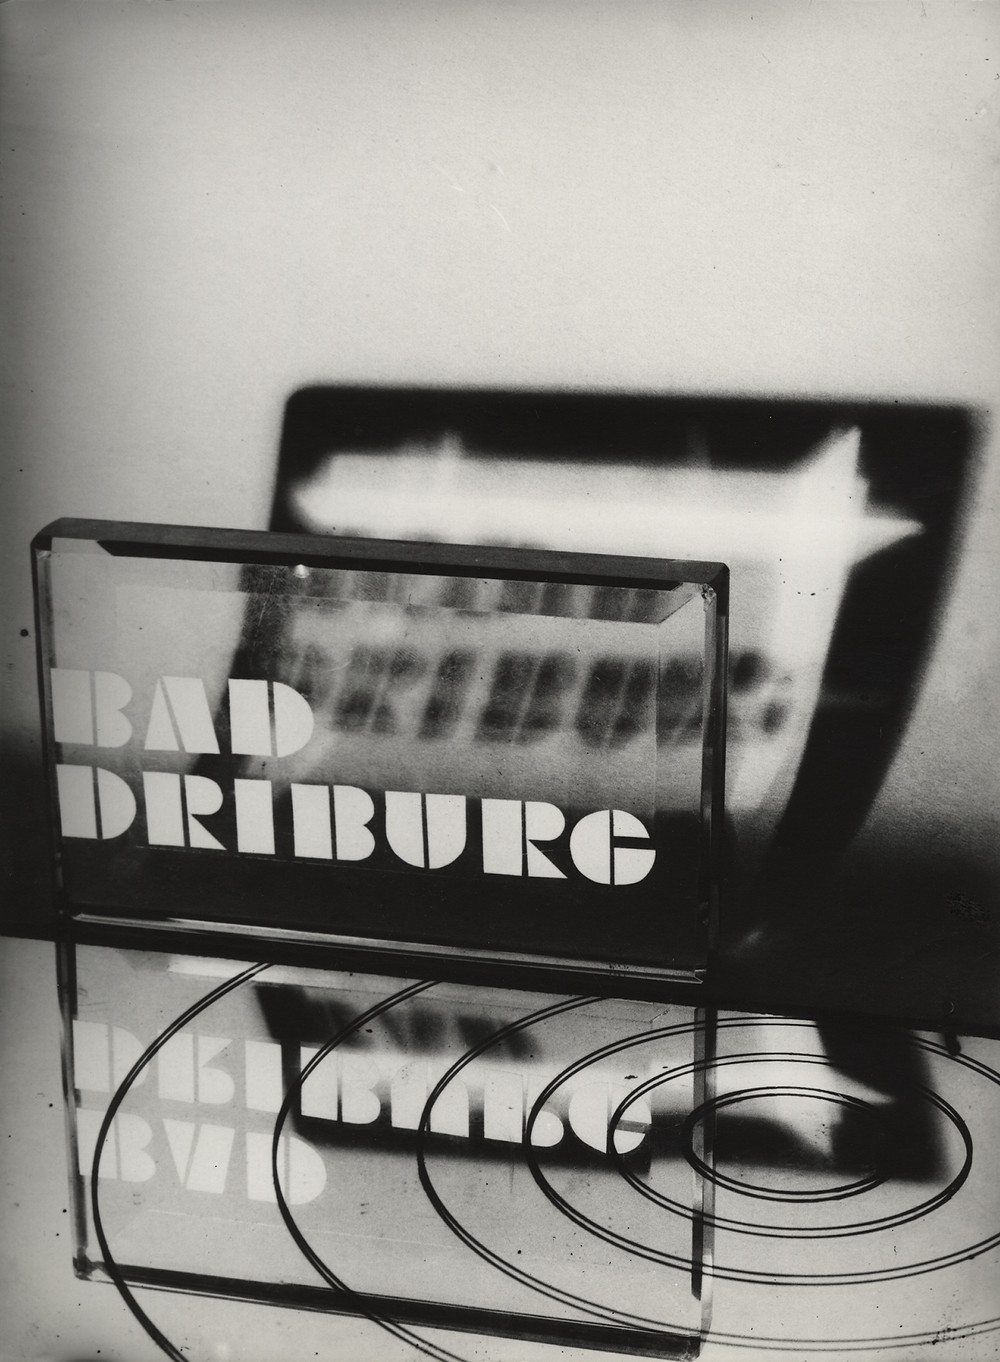 Wittkugel_1931_Bad-Driburg